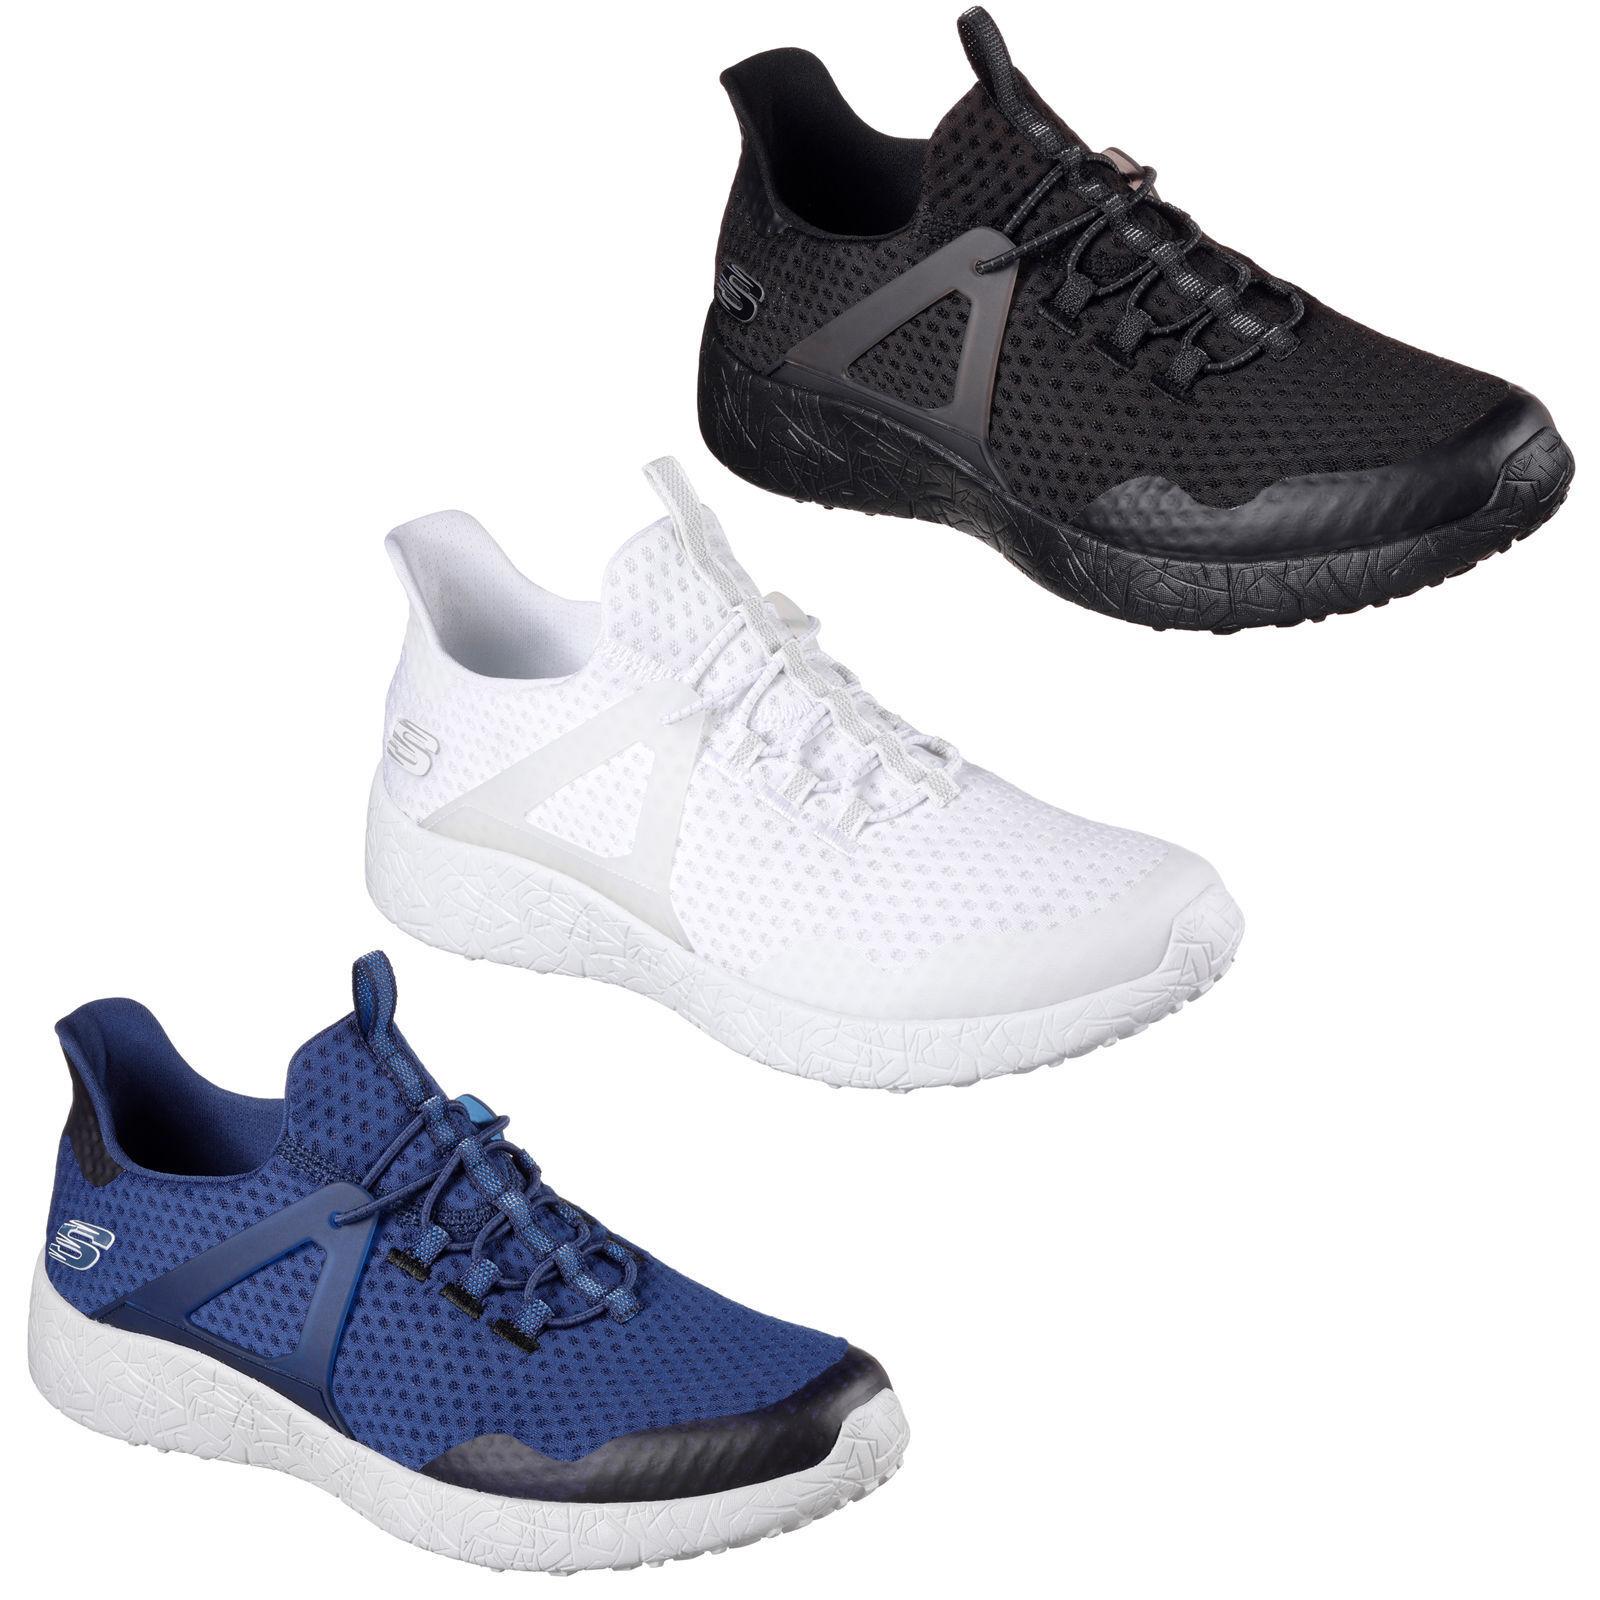 Skechers Burst shinz Scarpe da ginnastica in Maglia Mesh Memory Foam shoesmens FASHION Sports